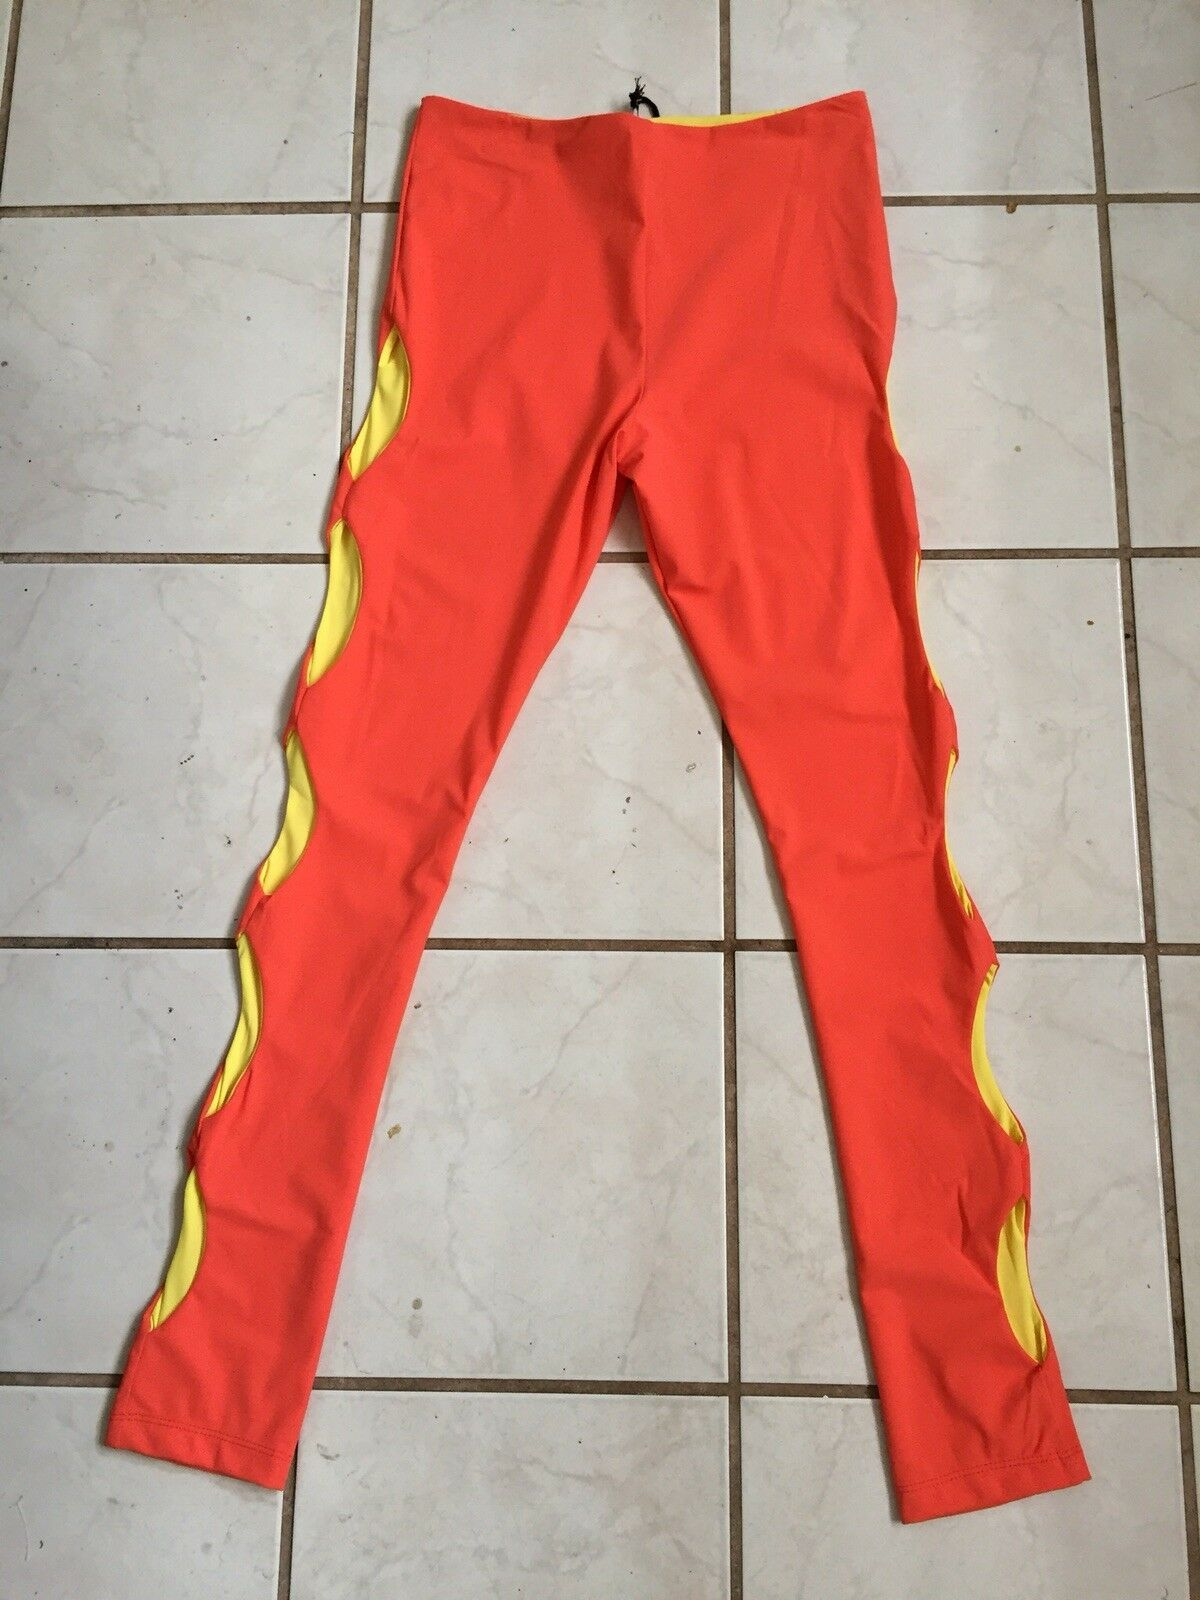 NOE Brand NEW  Bright orange Yellow Fitness Dance Leggings w  Cut Out Legs Sz S